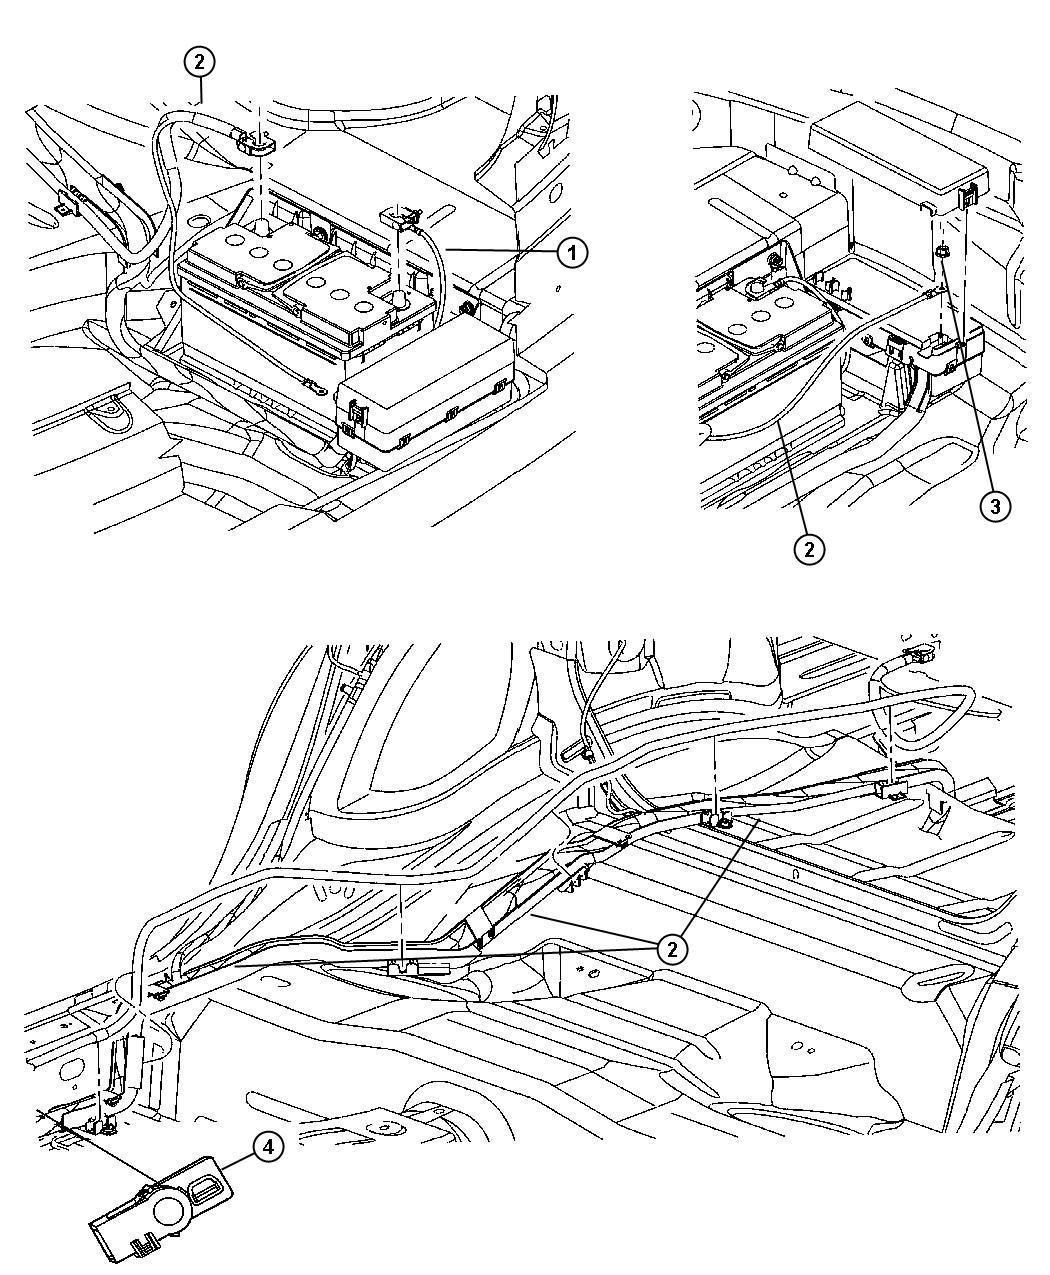 Chrysler 300 Nut. Hex flange lock. M8x1.25. Mounting